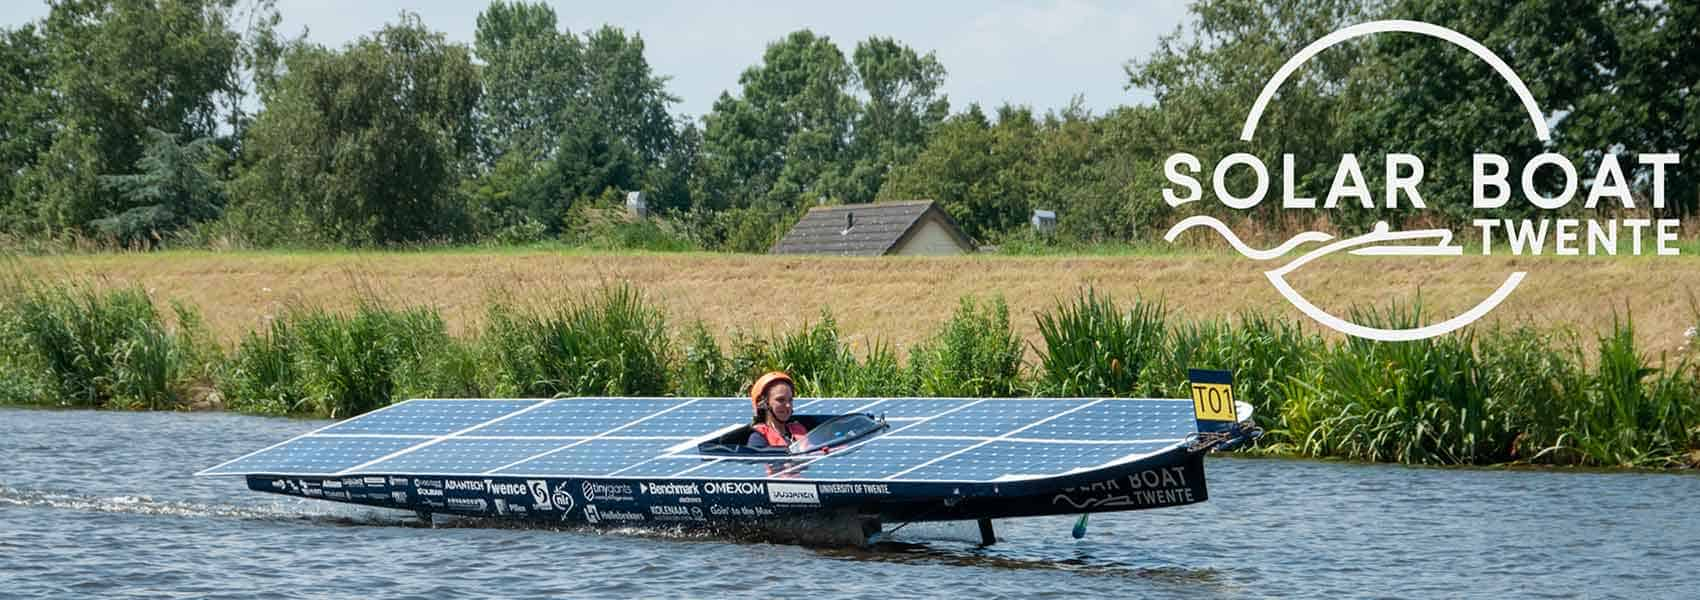 Solar-Boat-Twente-Blog-Banner